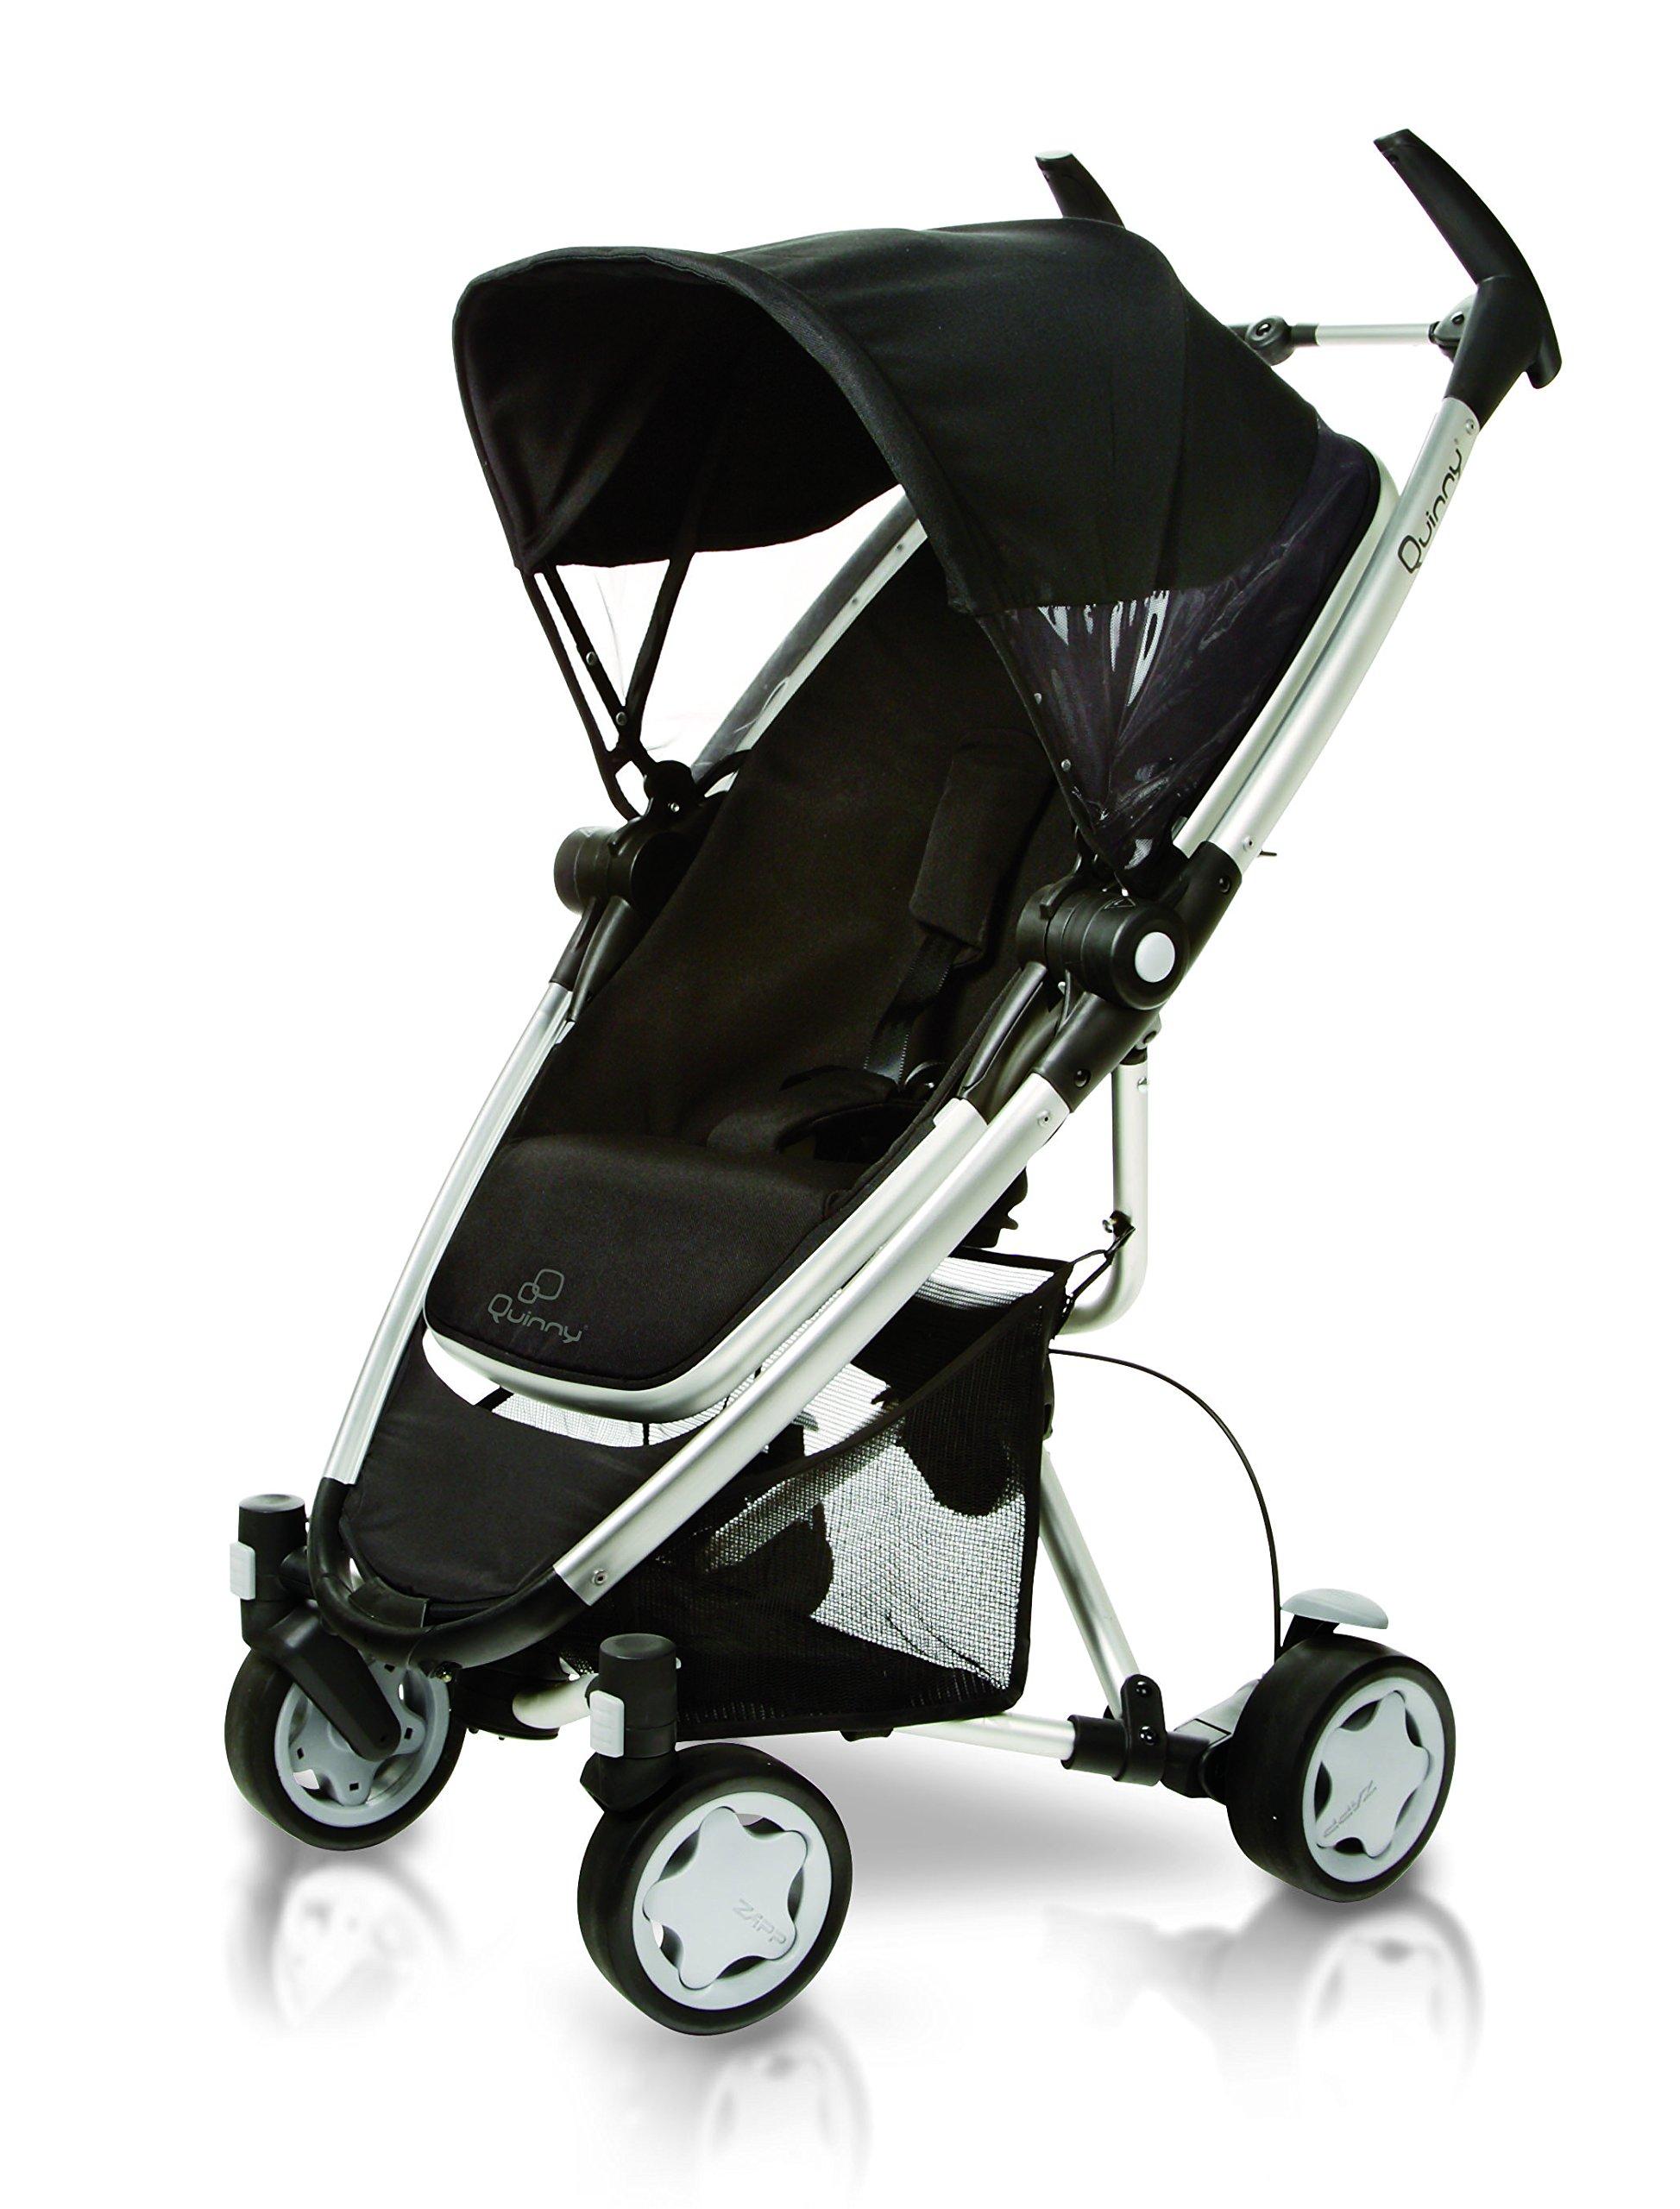 Maxi Cosi Mico Car Seat Adapter Quinny